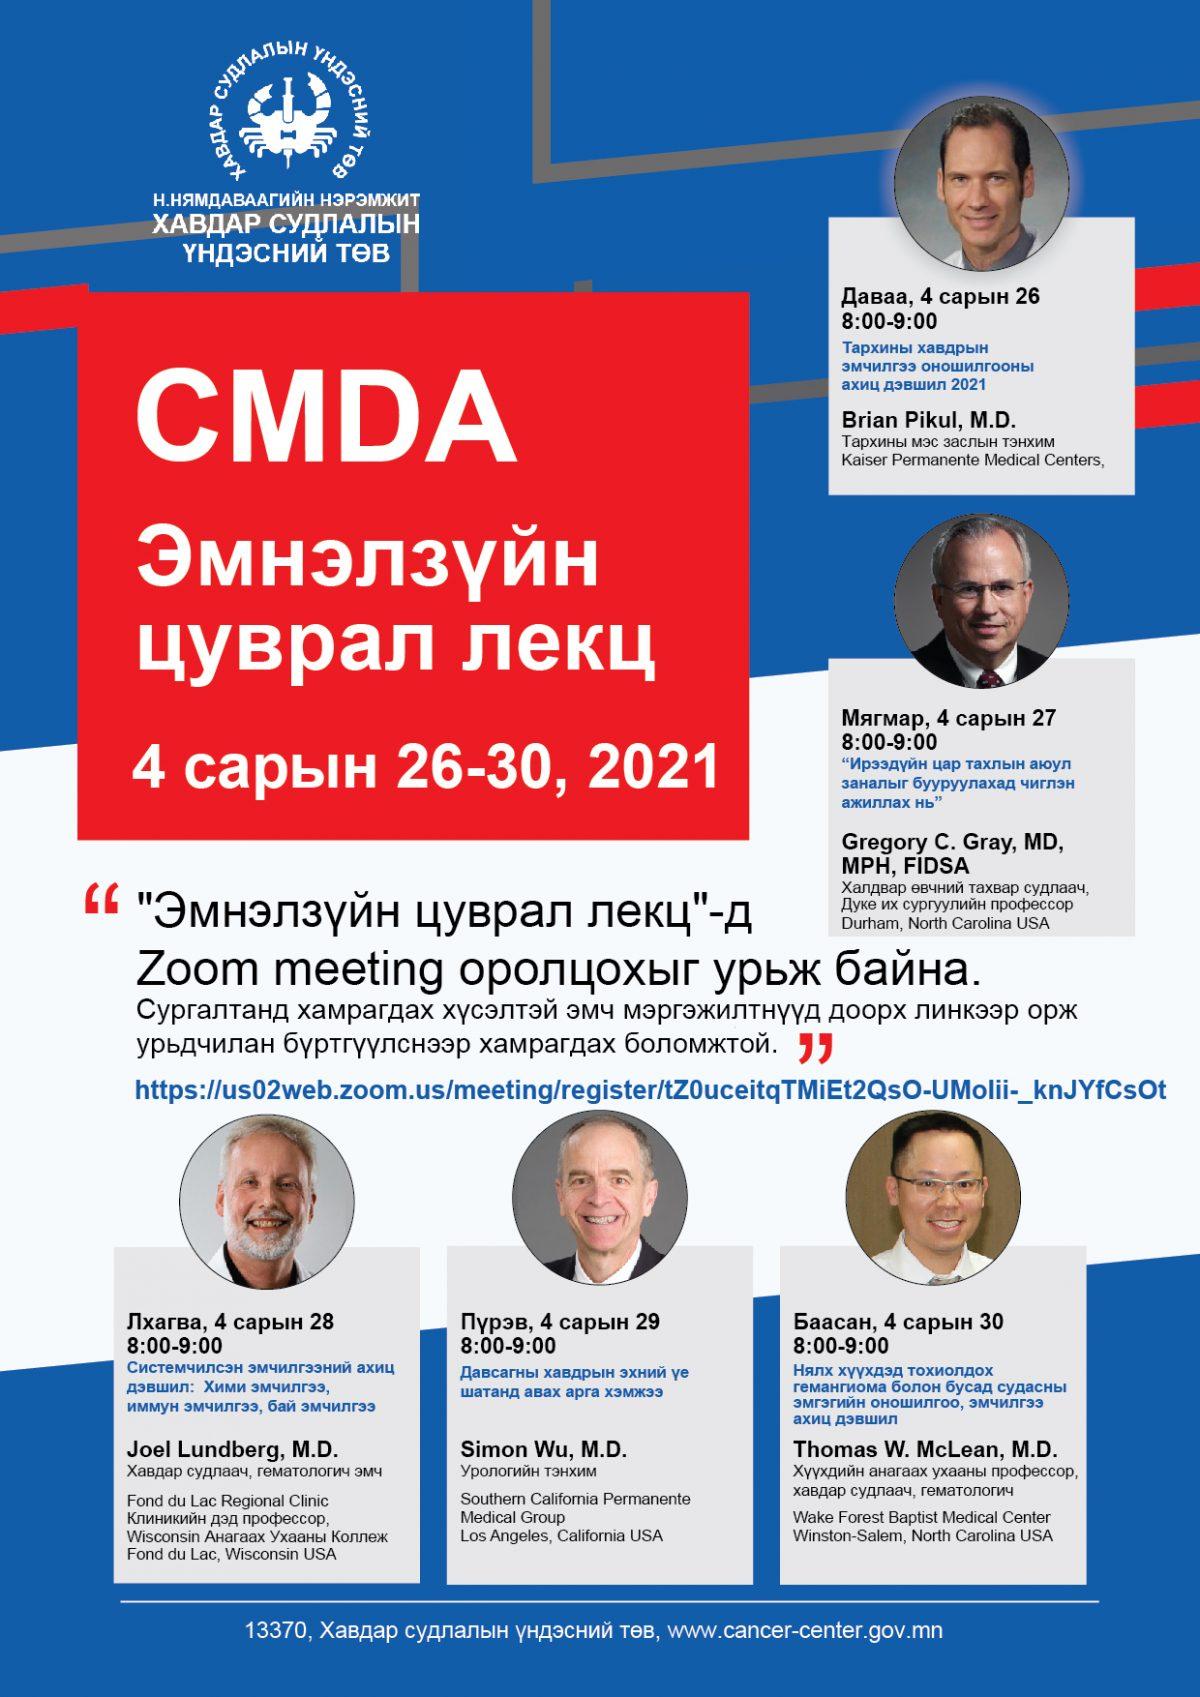 CDMA-lecture-bulgan-01-1200x1697.jpg